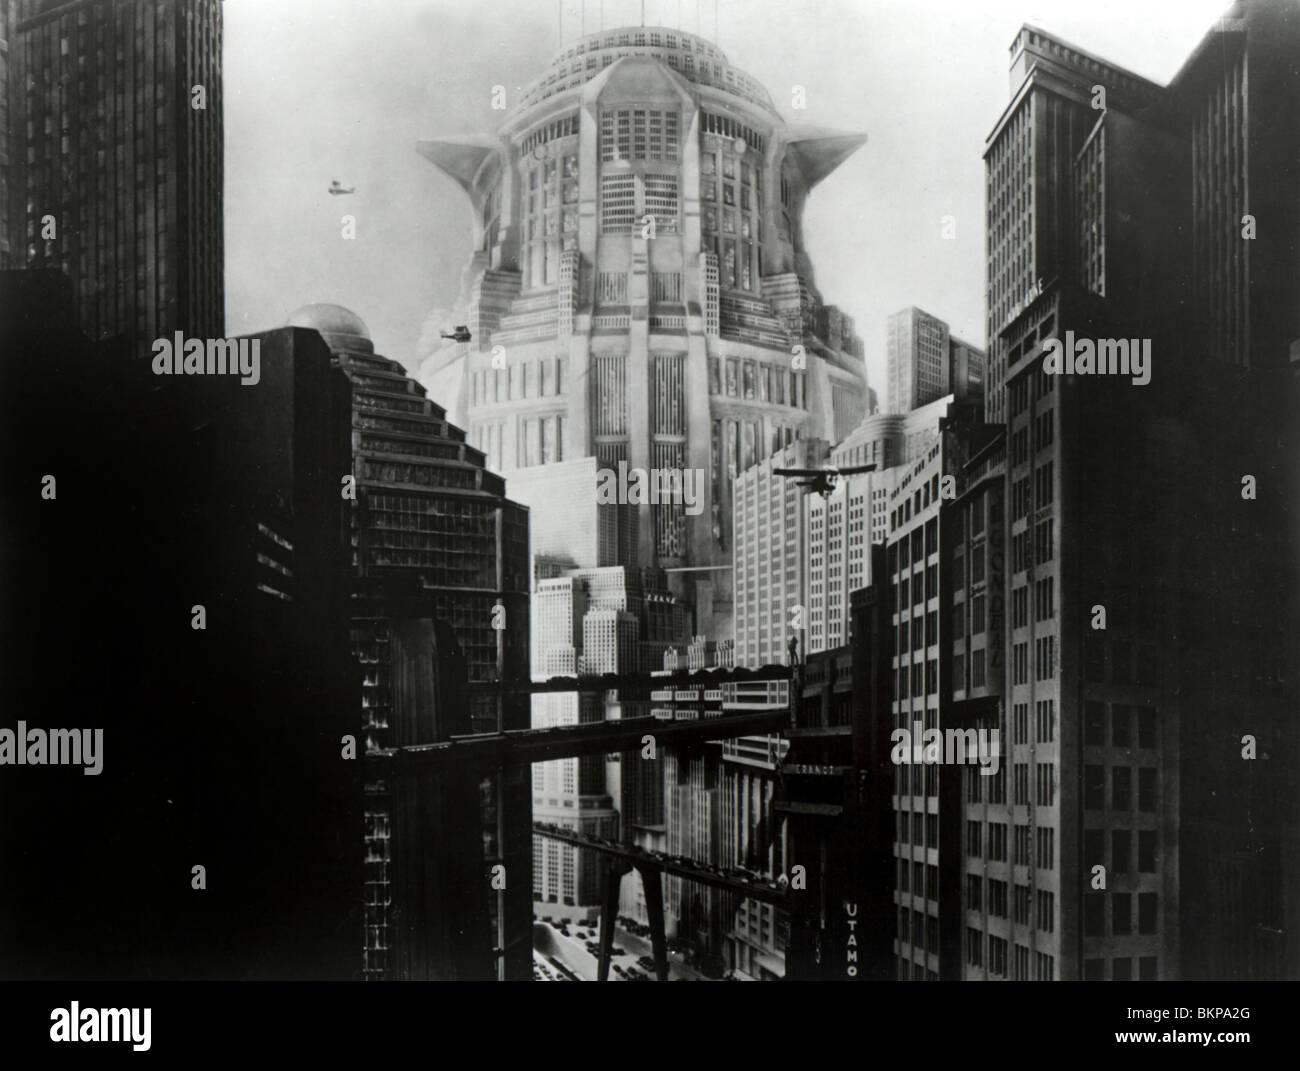 METROPOLIS -1927 - Stock Image